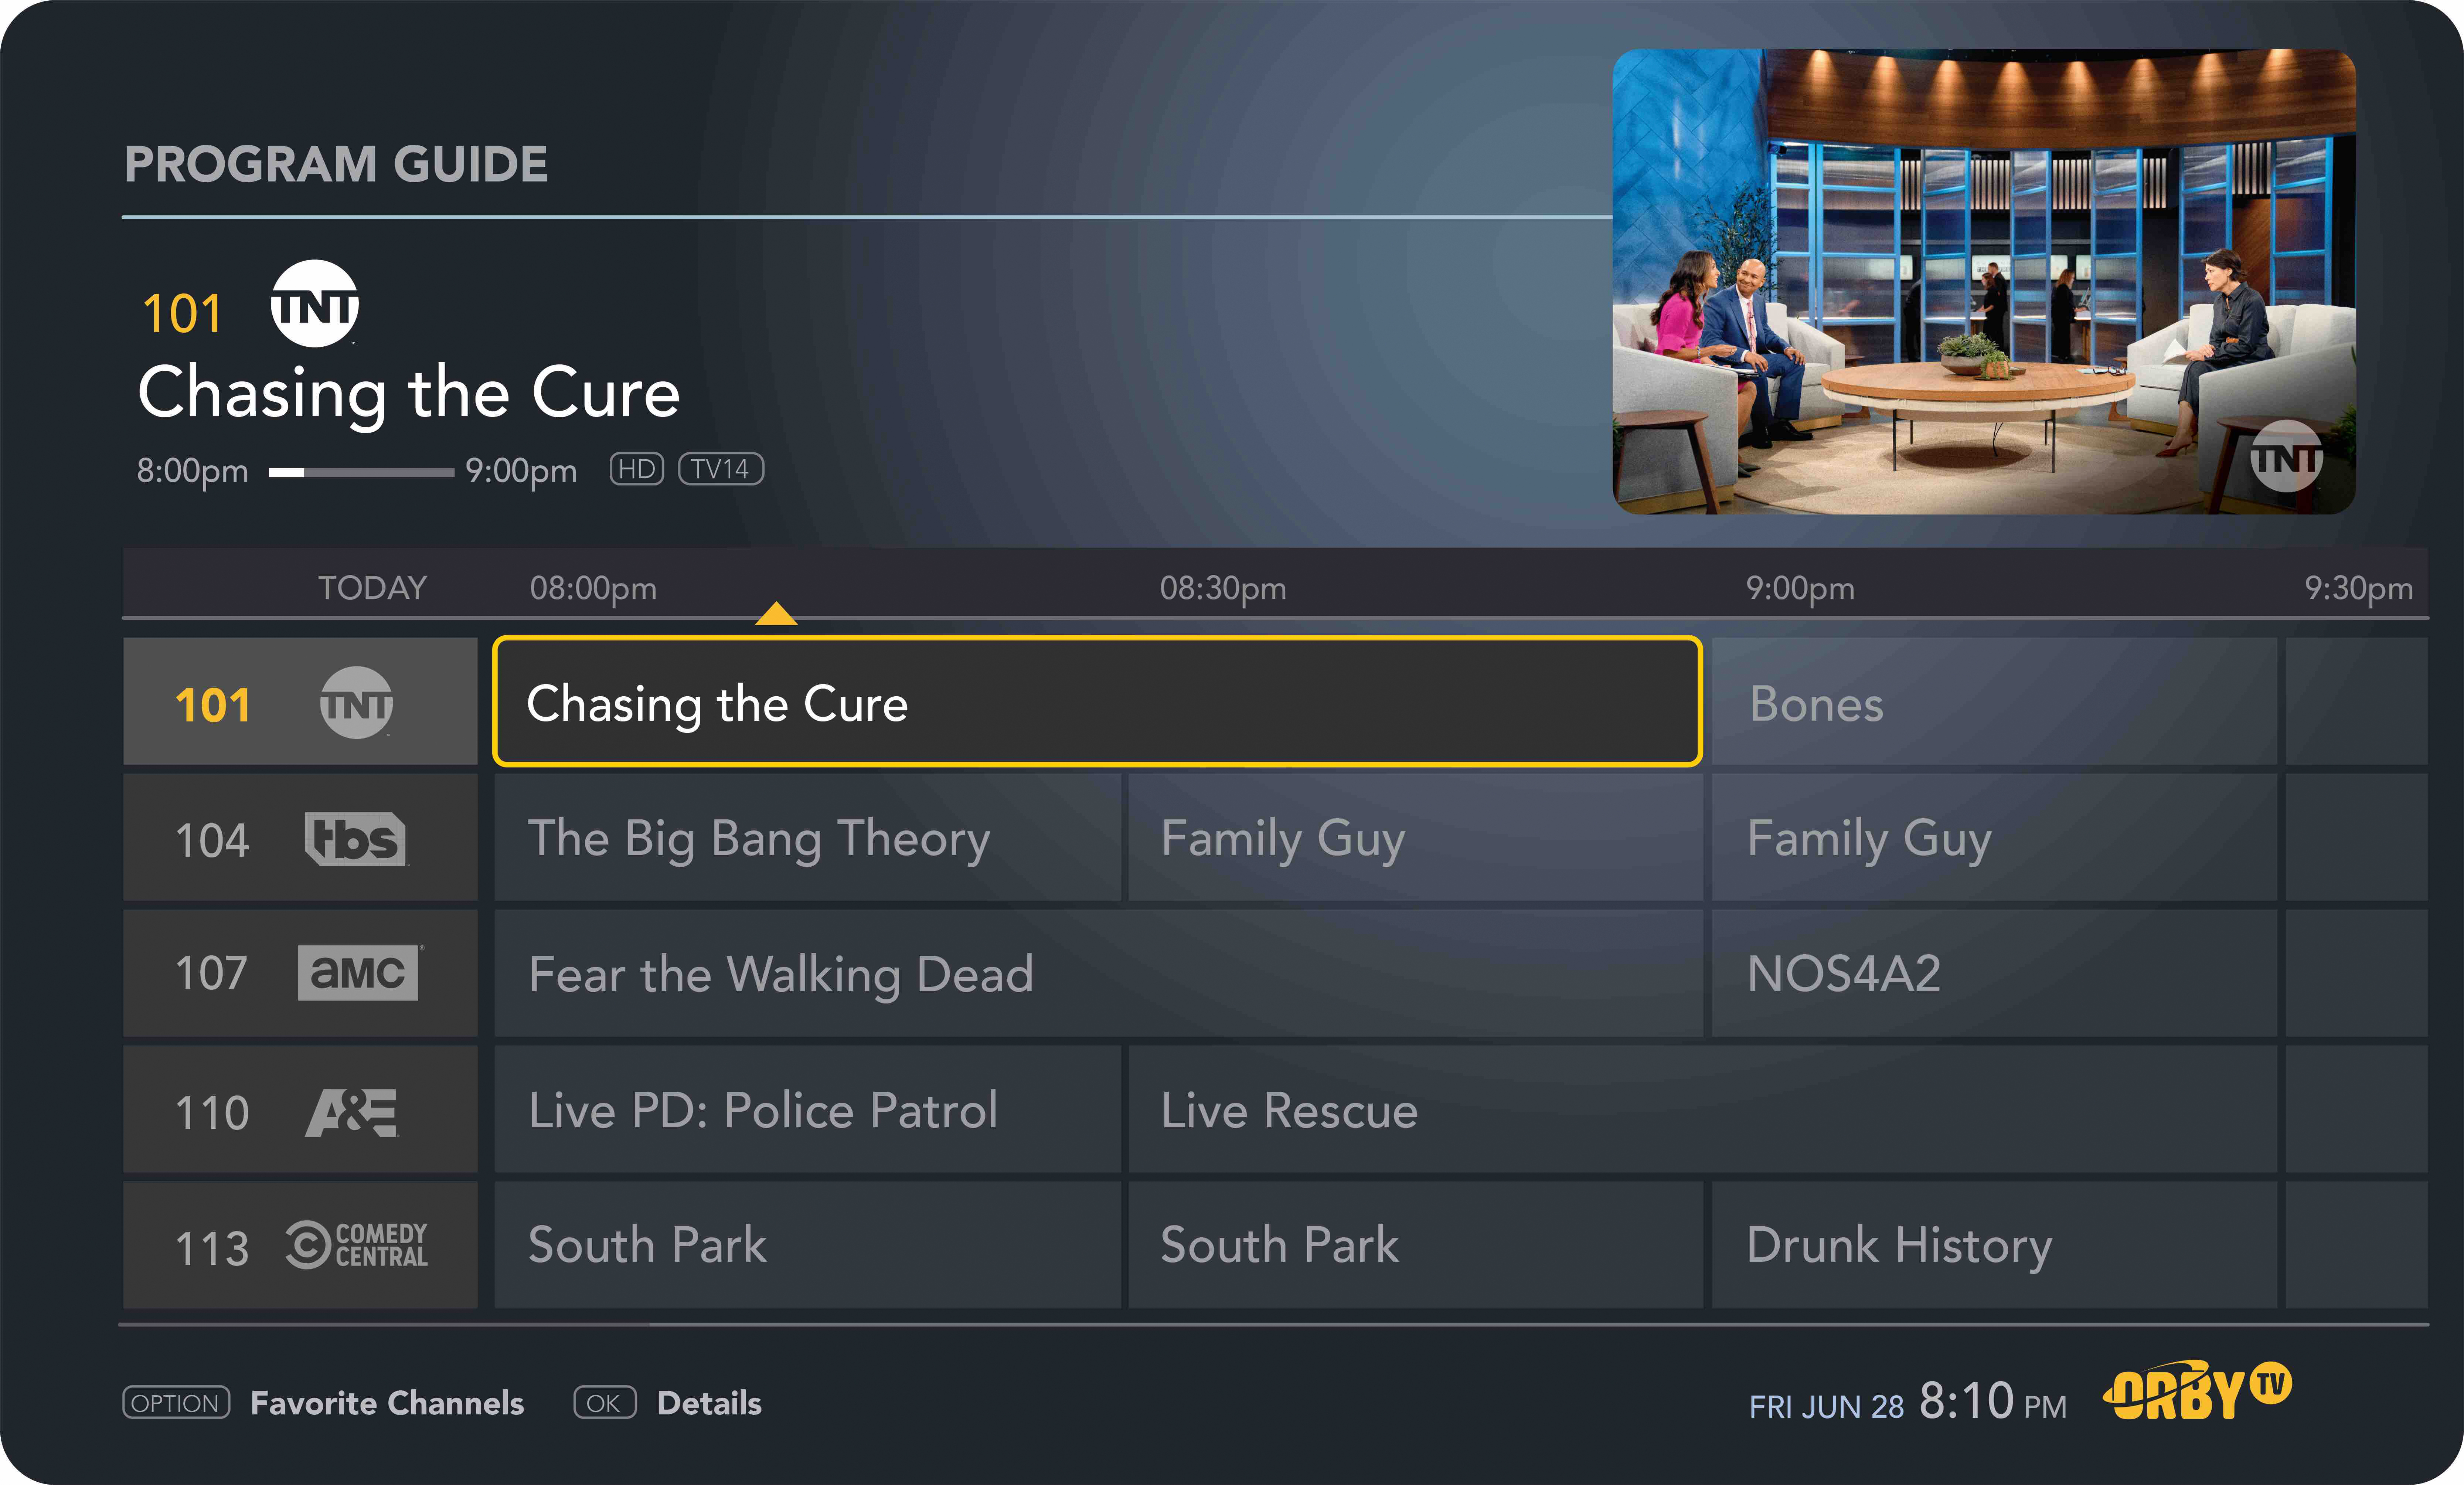 Tv Service Providers >> New U S Satellite Television Provider Orby Tv Announces